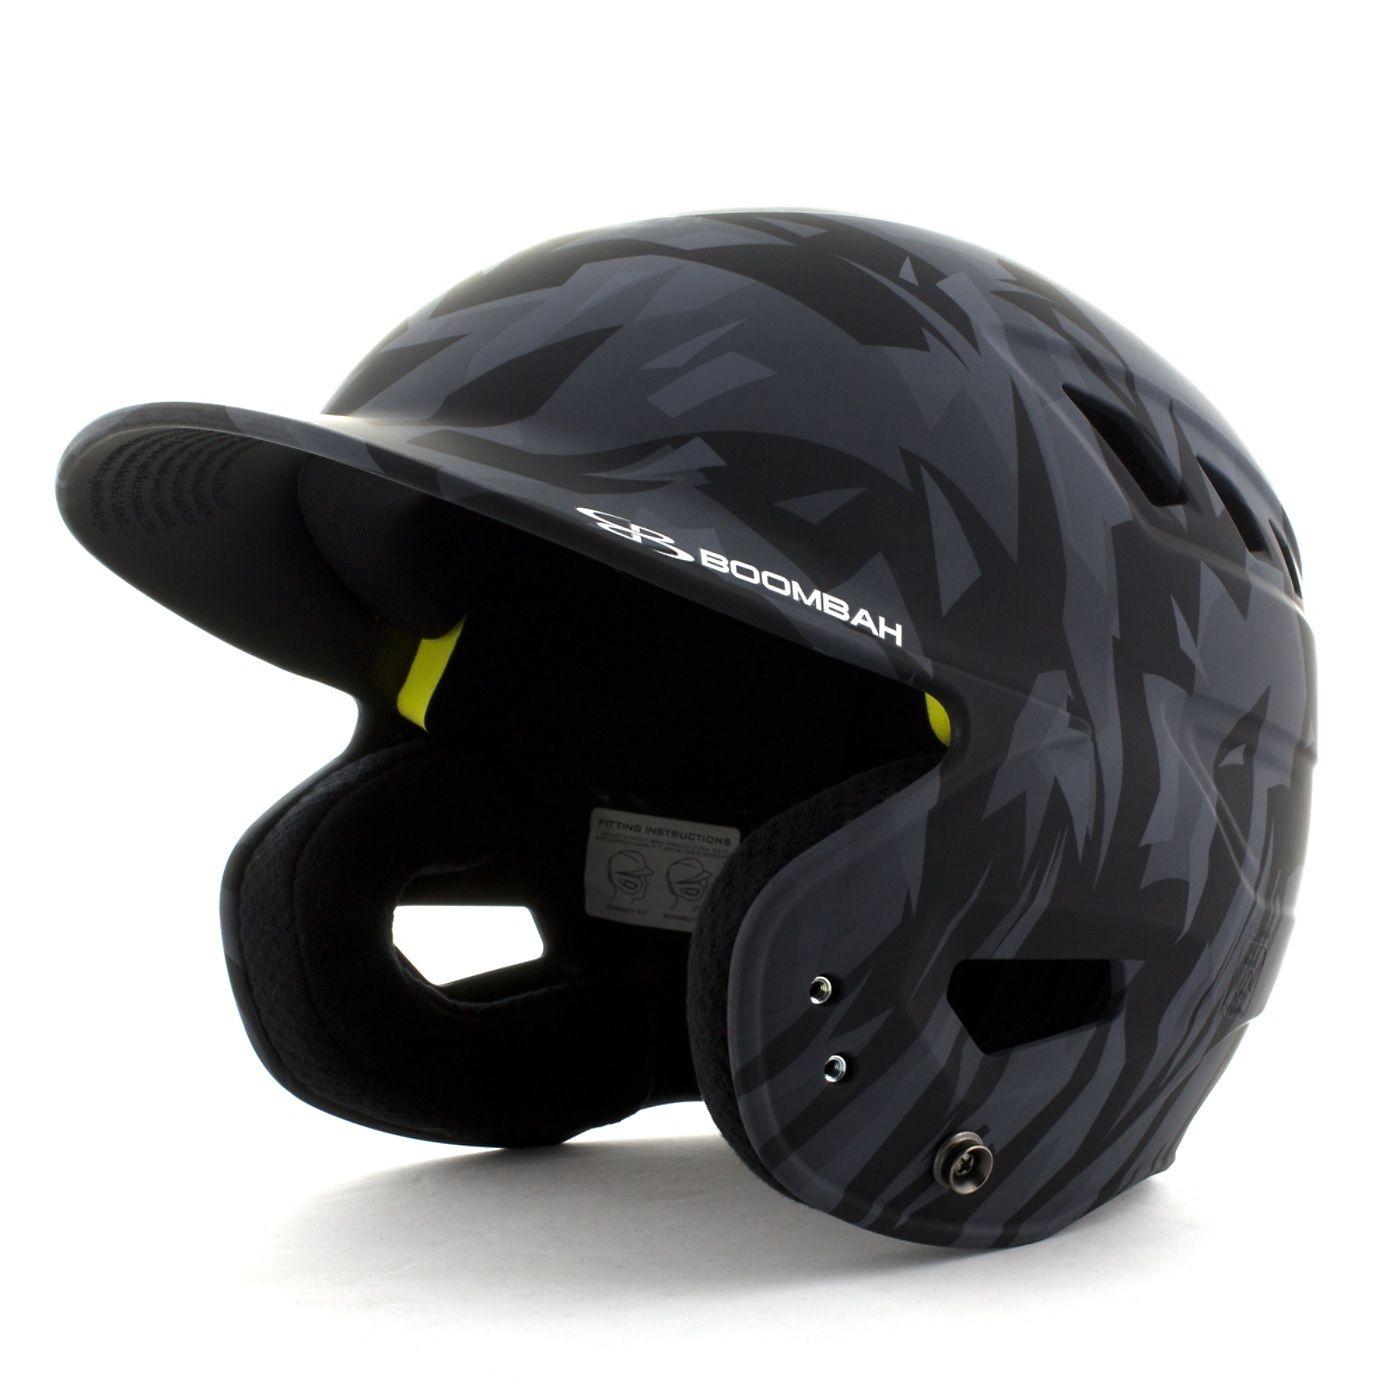 Boombah DEFCON Stealth Camo Batting Helmet Black Batting